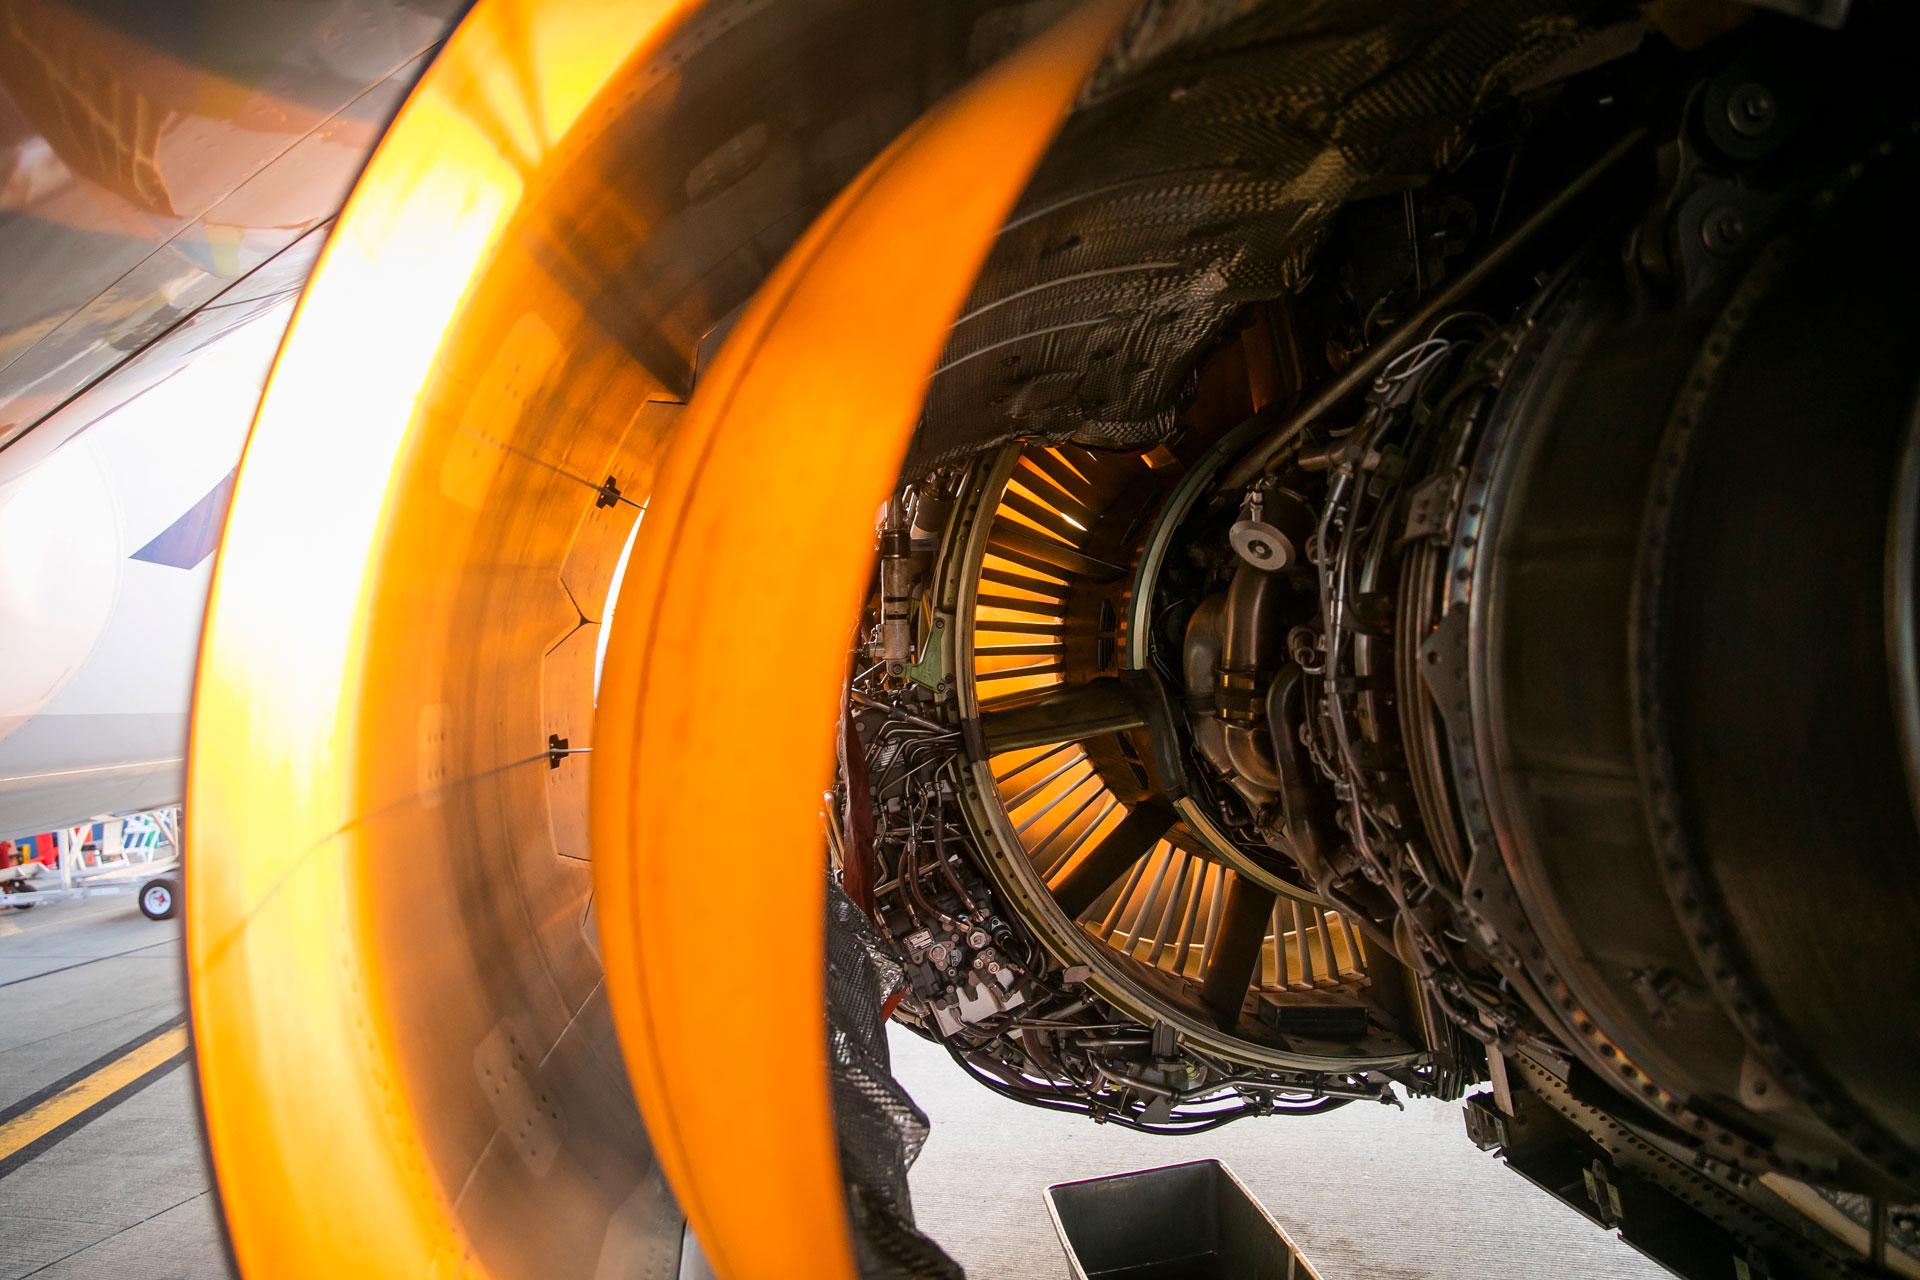 Inside of a jet engine